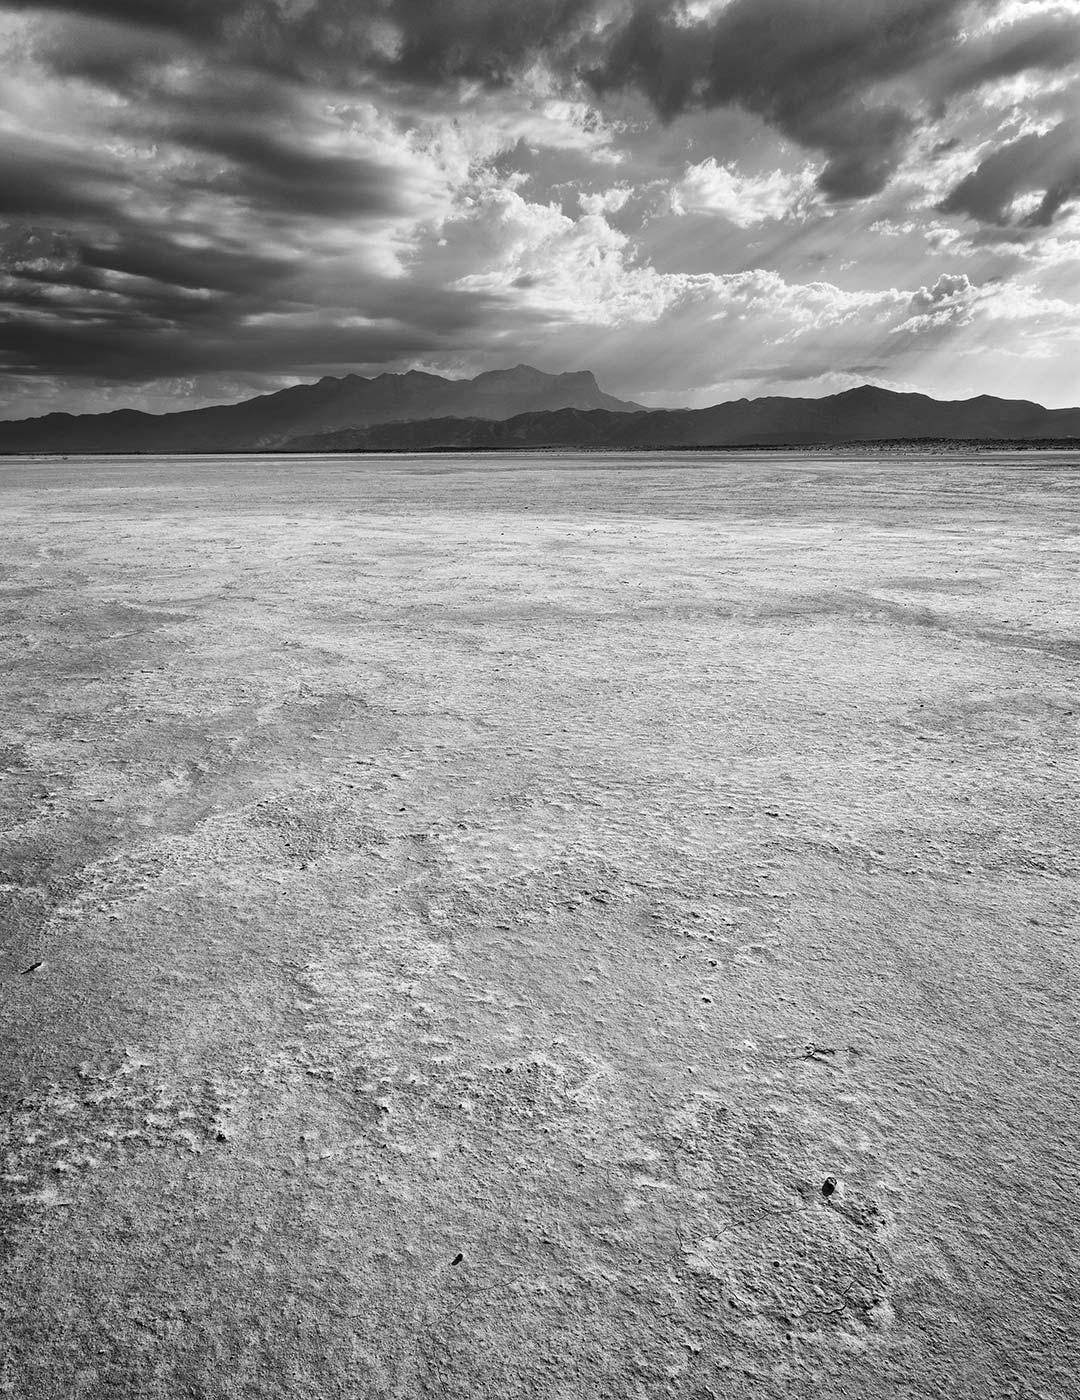 West-Texas-ABP-Salt-Flat_Guadalupe-Mtns.jpg